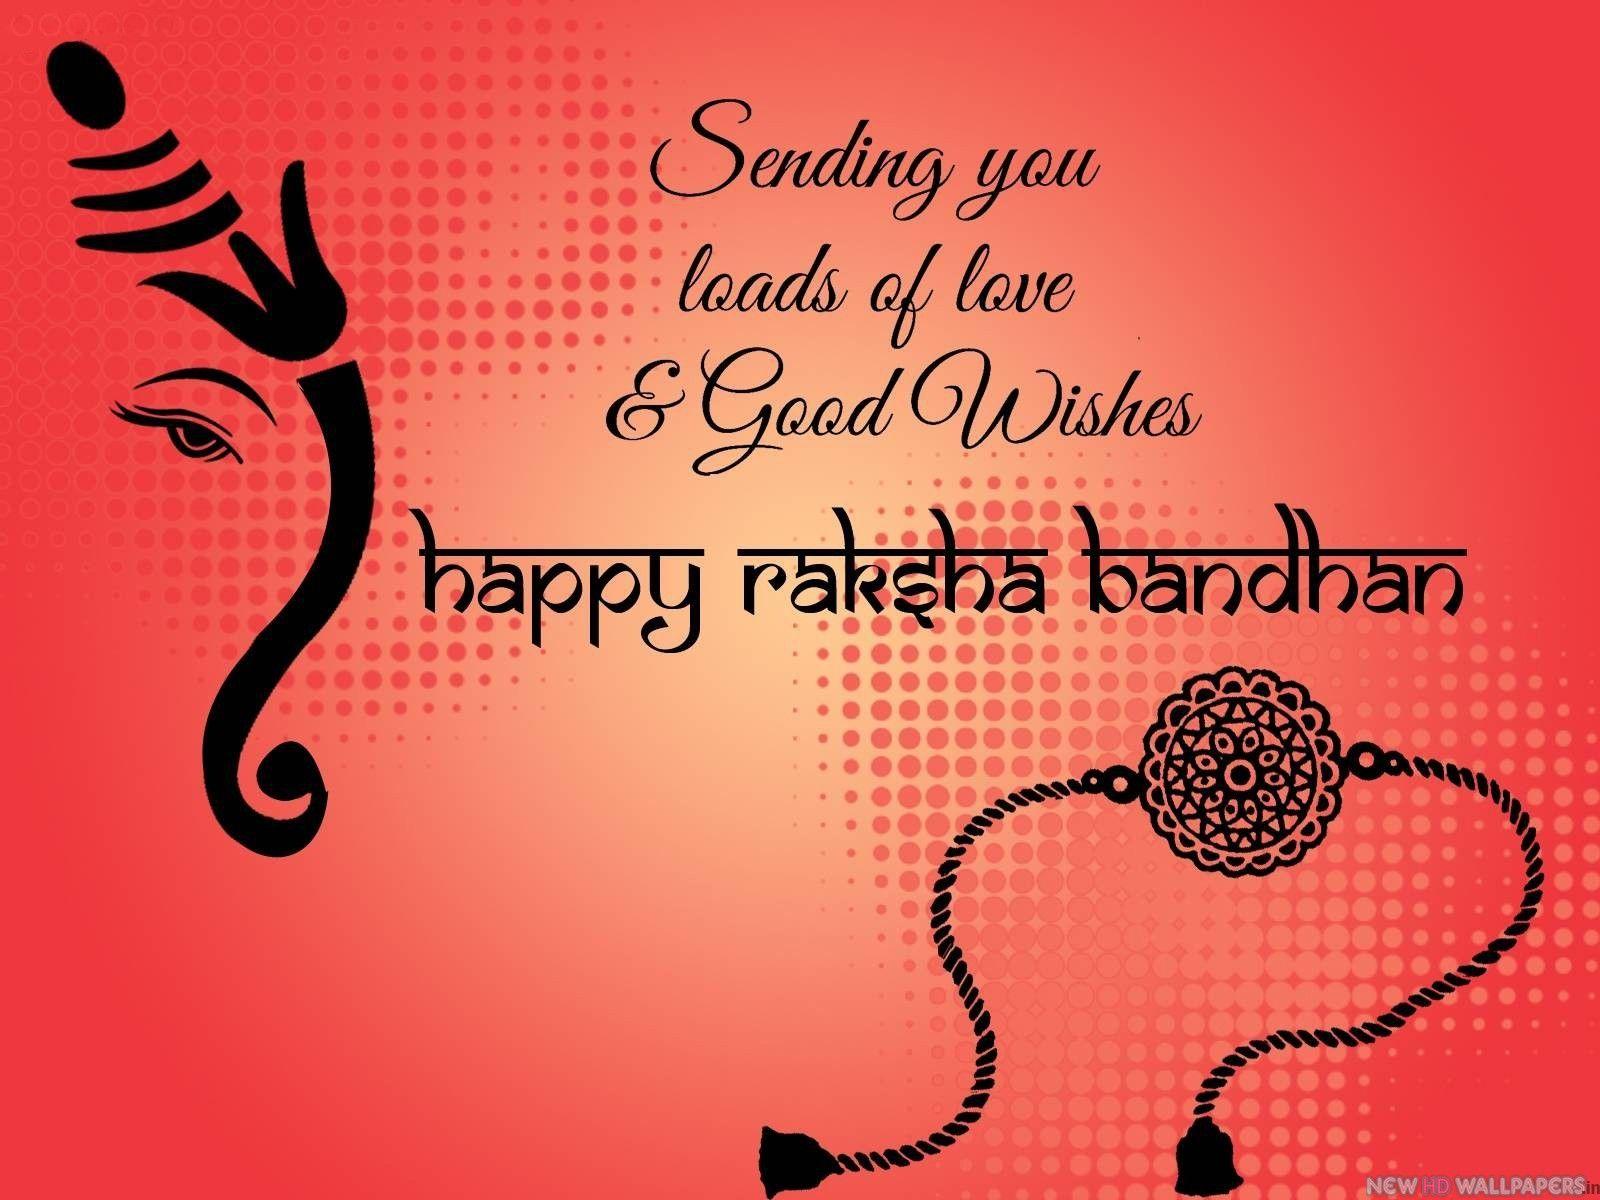 Happy Raksha Bandhan Rakhi Wishes Images Pictures Happy Raksha Bandhan Images Raksha Bandhan Quotes Rakhi Wishes